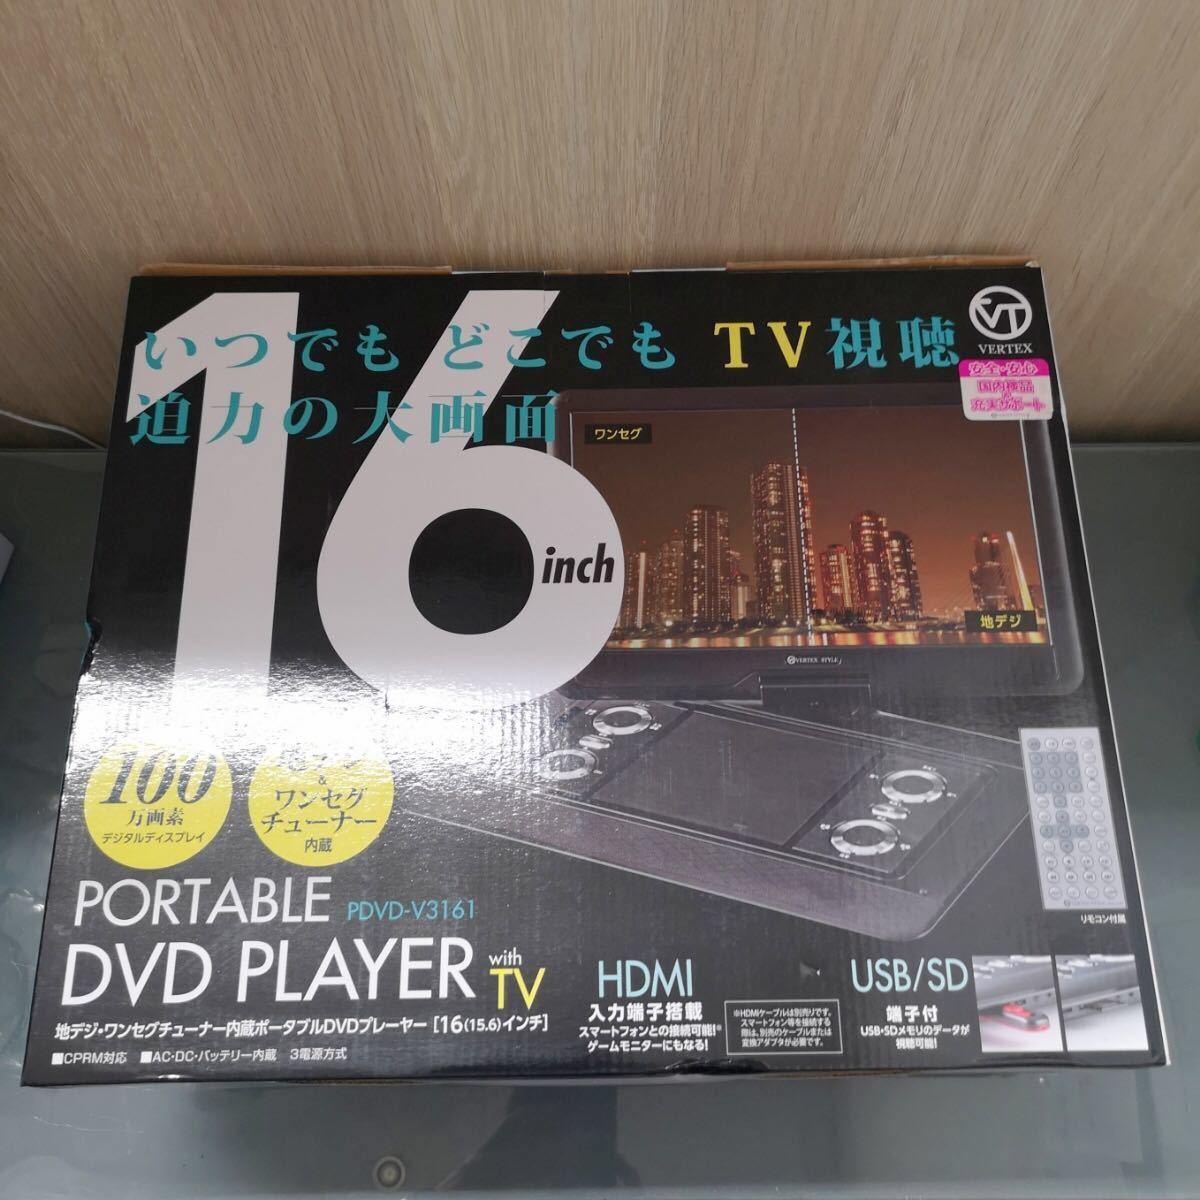 ◆PORTABLE DVD PLAYER◆ ほぼ新品/付属品全てあり/型番:PDVD-V3161/地デジ・ワンセグチューナー内蔵ポータブルDVDプレーヤー/DE0